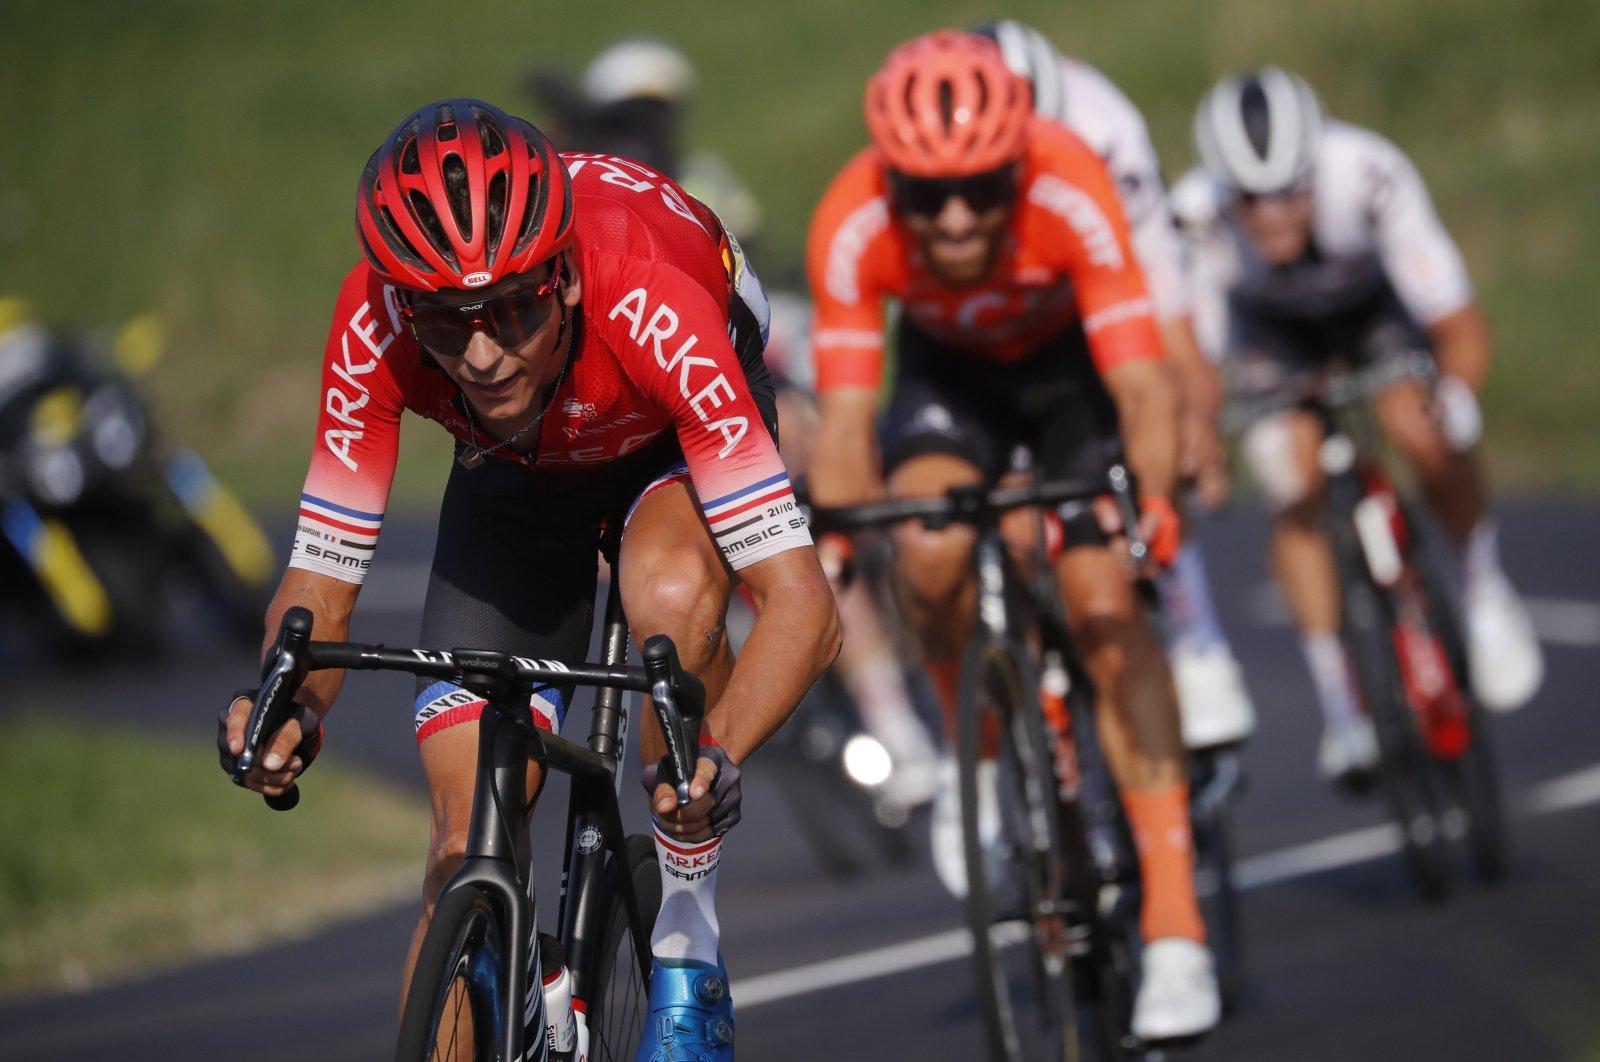 Team Arkea-Samsic rider Warren Barguil of France in action during the 16th stage of Tour de France, near Villard de Lans, France, Sept. 15, 2020. (Reuters Photo)